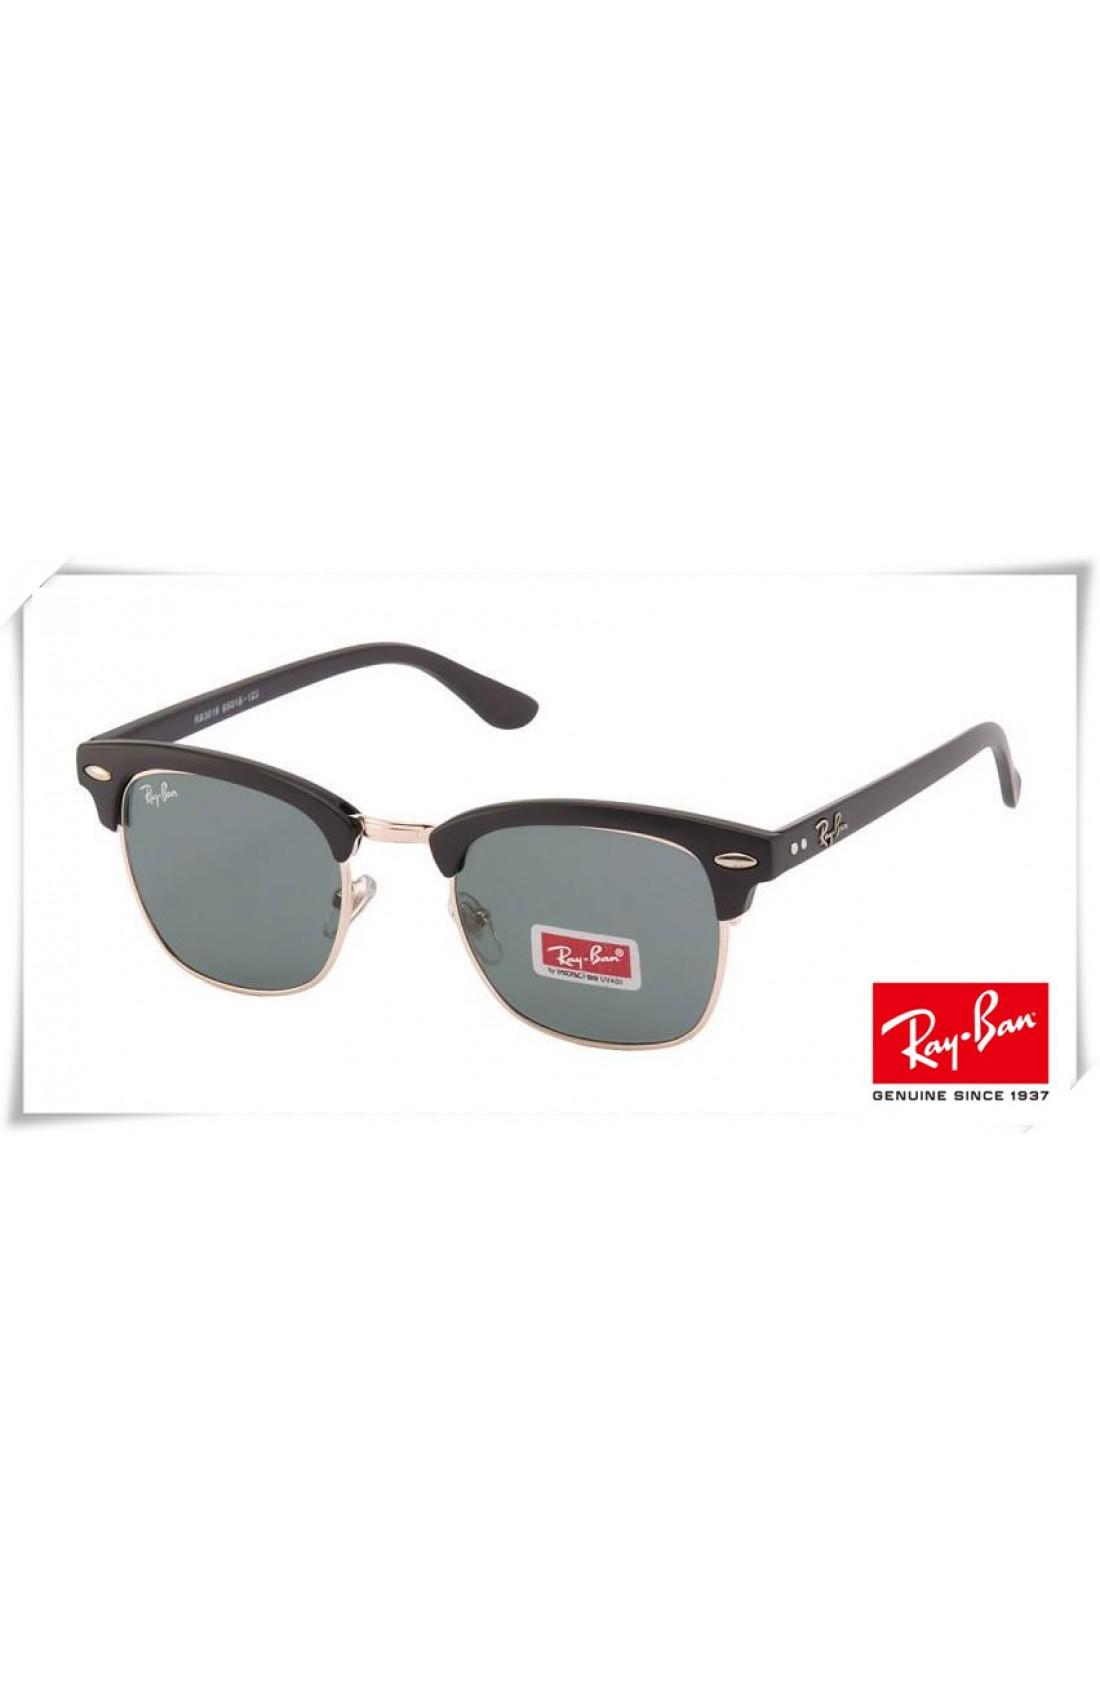 c5b499bcd16b8 Cheap Fake Ray Ban RB3016 Classic Clubmaster Sunglasses Black Gold ...